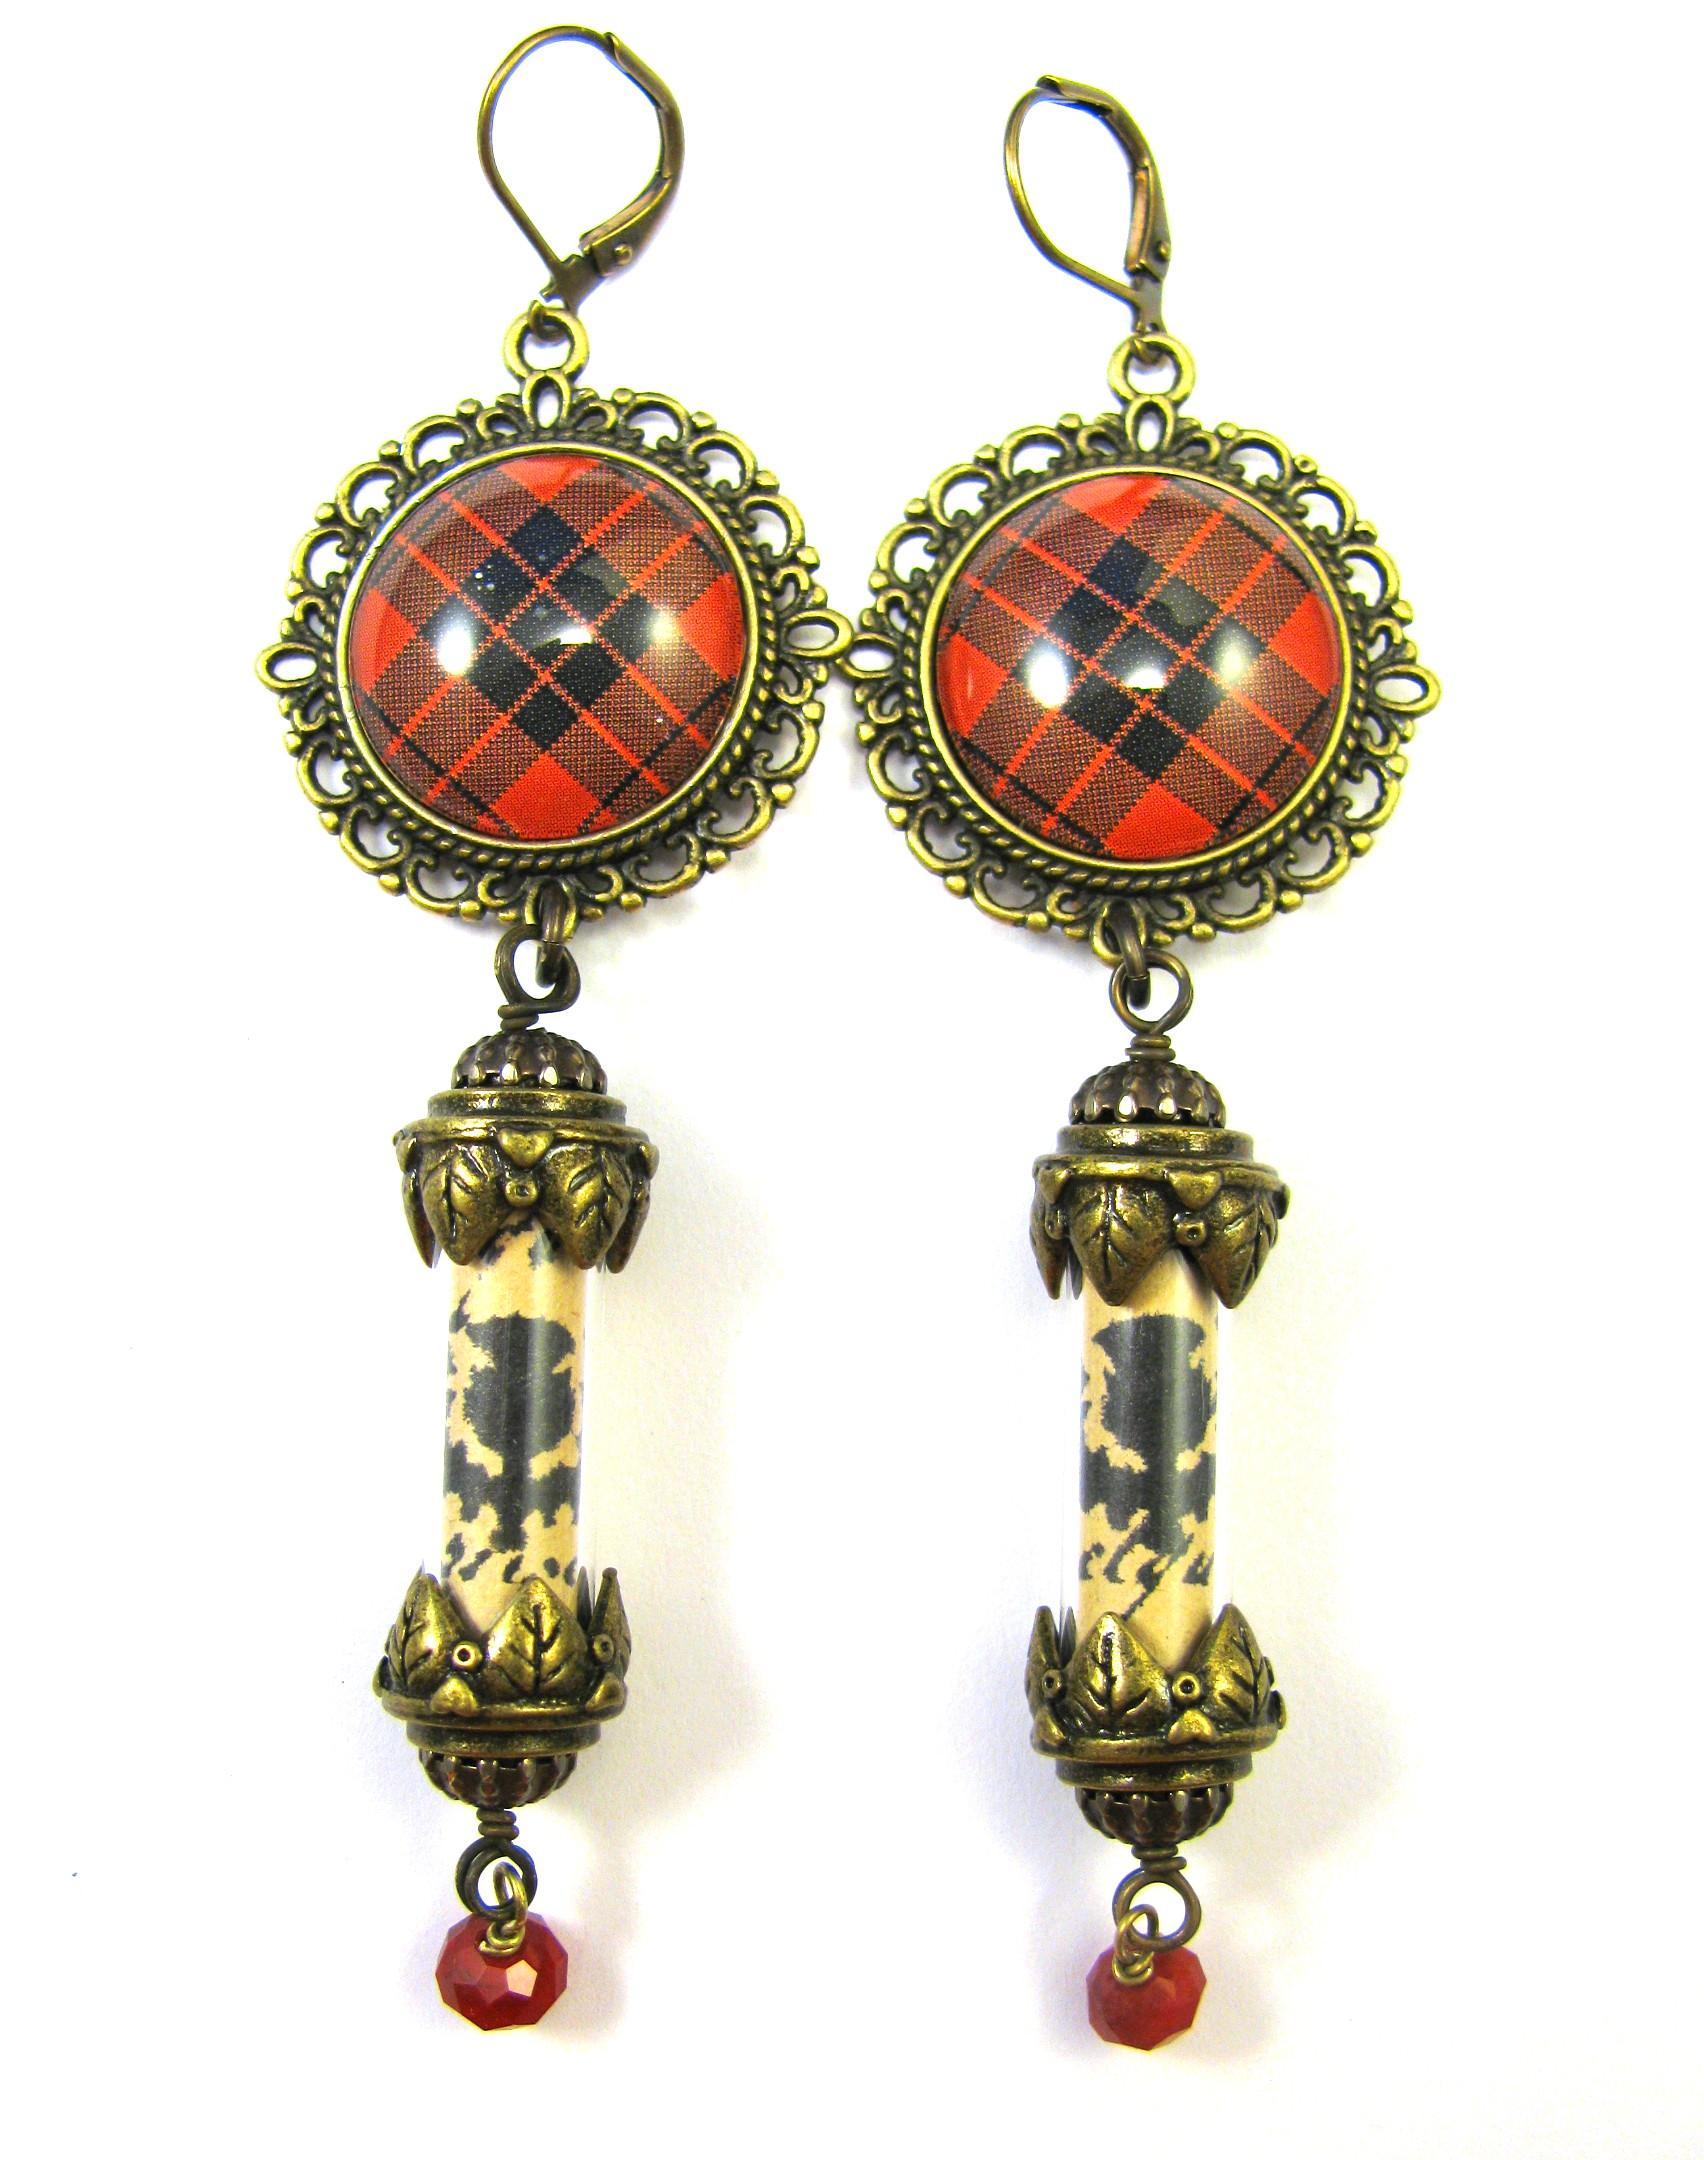 clan macleod scotclans scottish clans